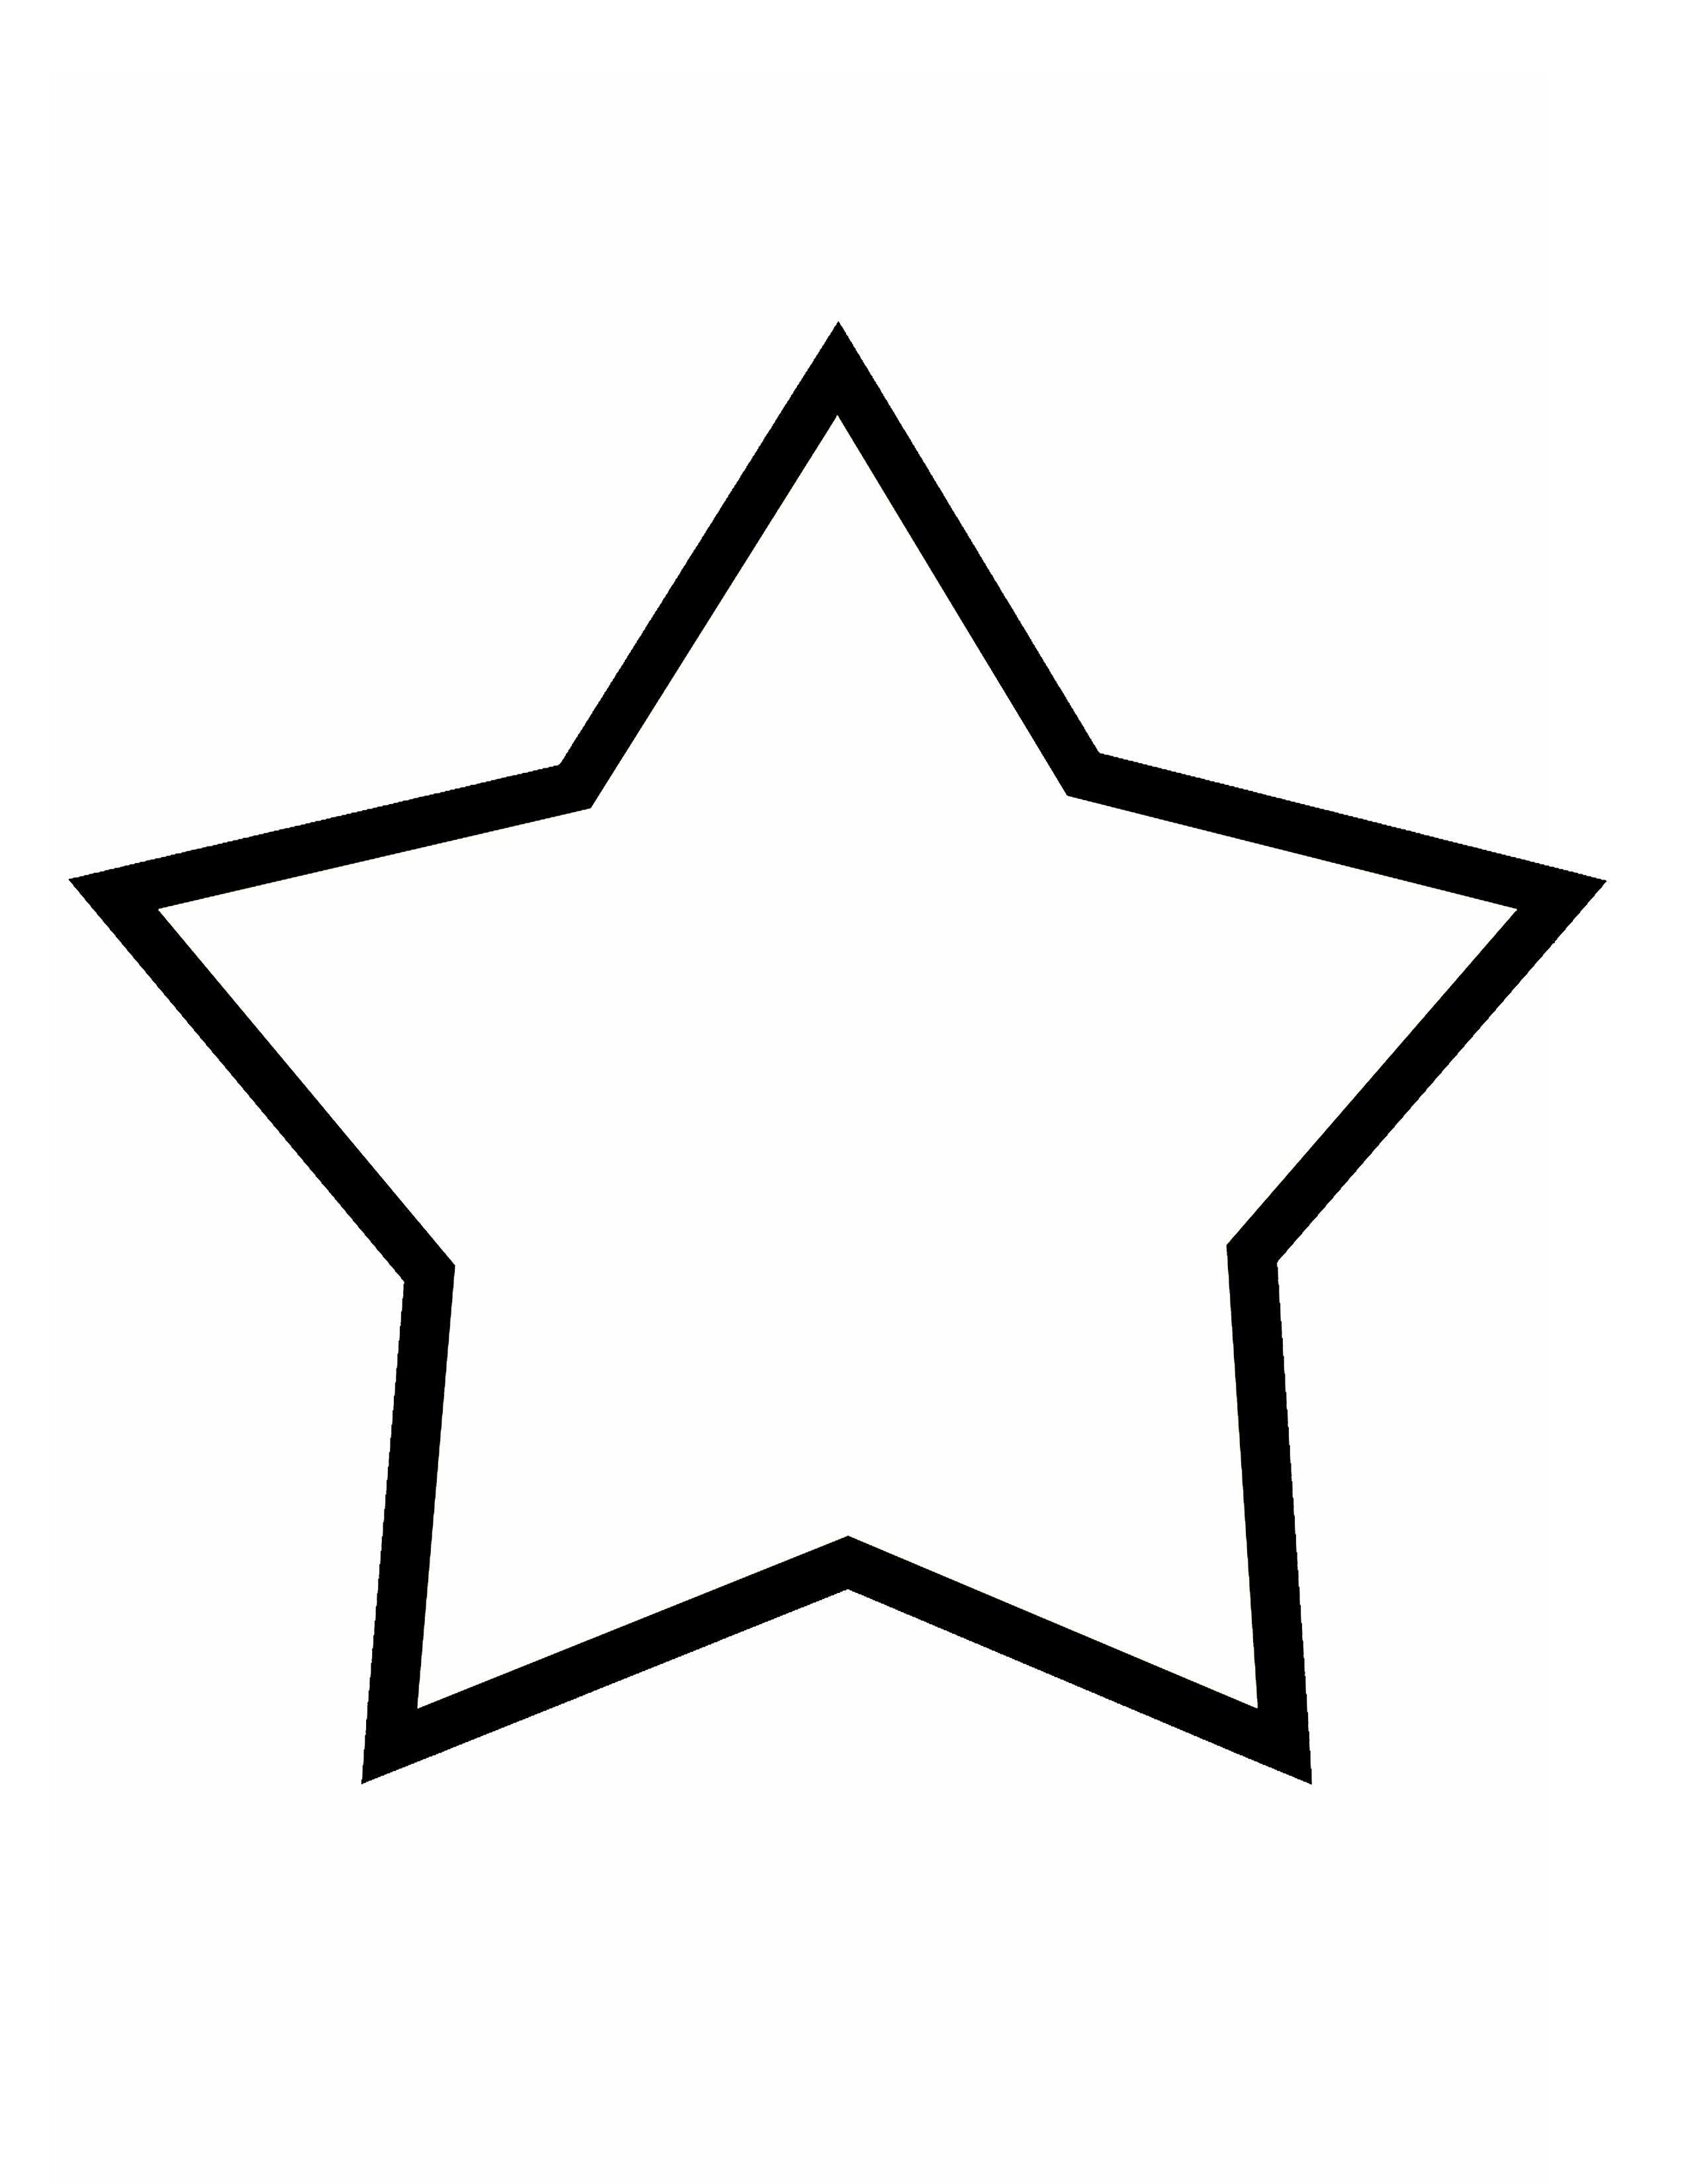 Printable star for Preschool Starlight Bible Story day 5